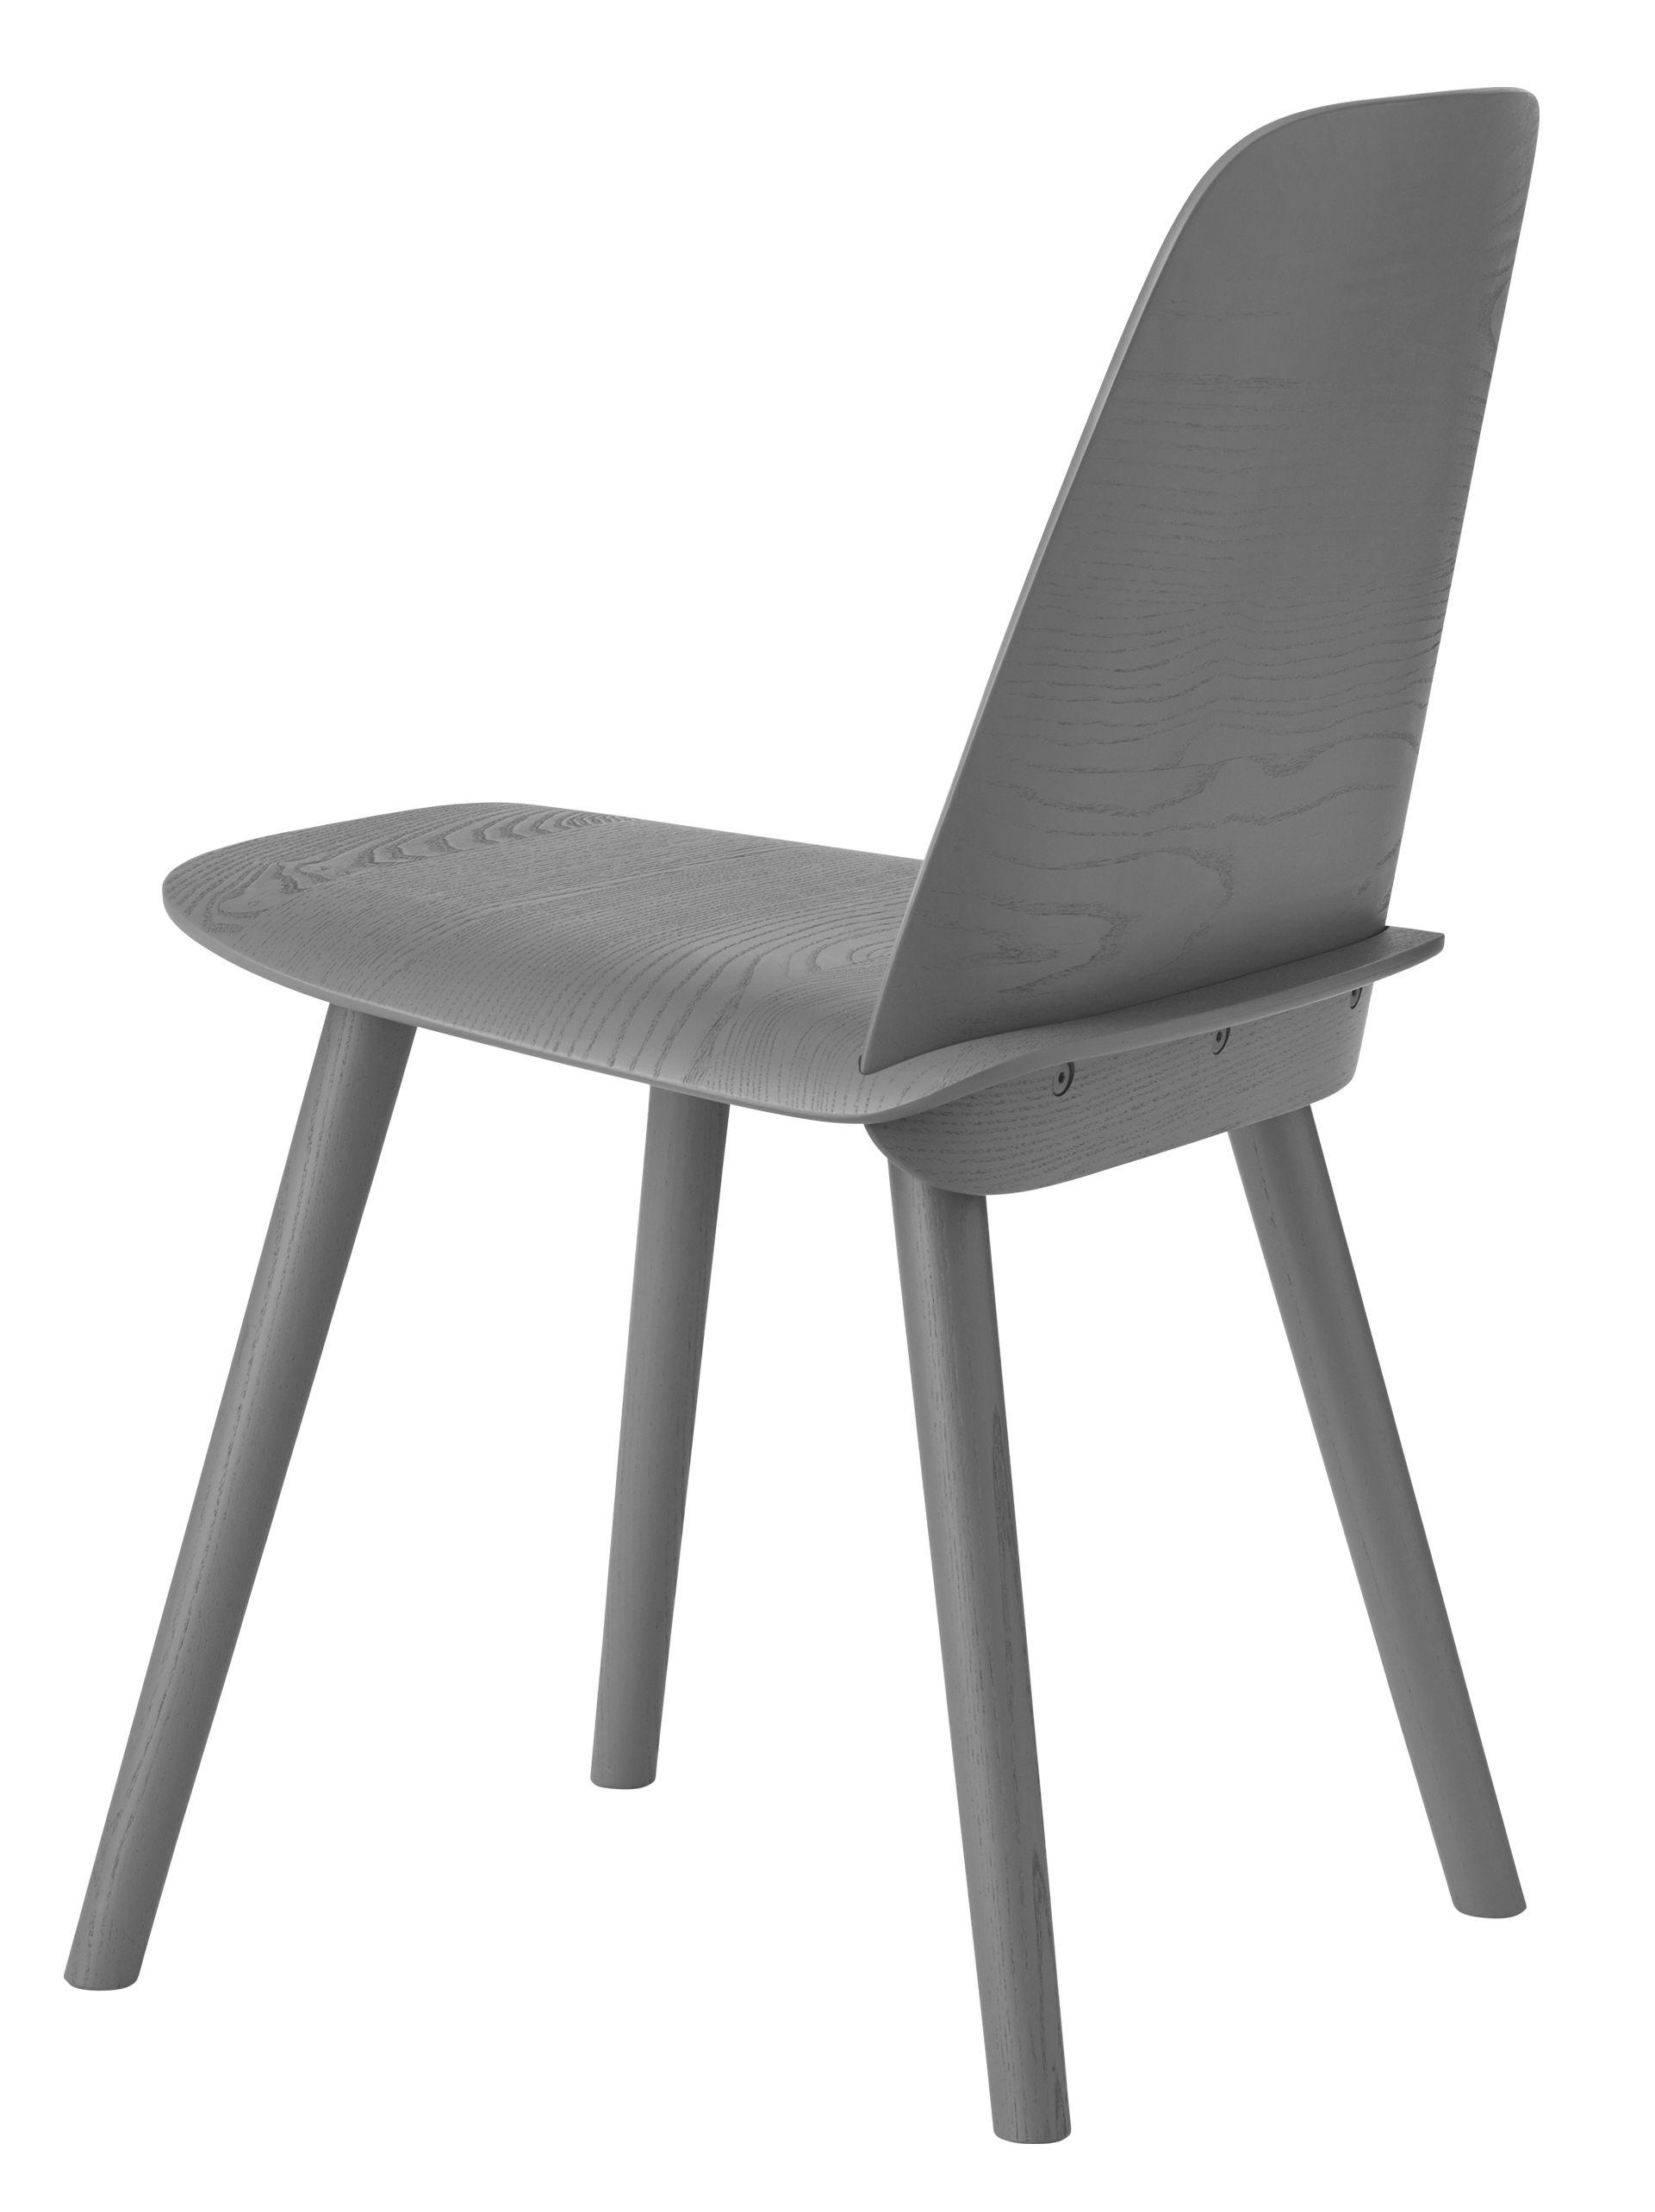 nerd holz muuto stuhl. Black Bedroom Furniture Sets. Home Design Ideas